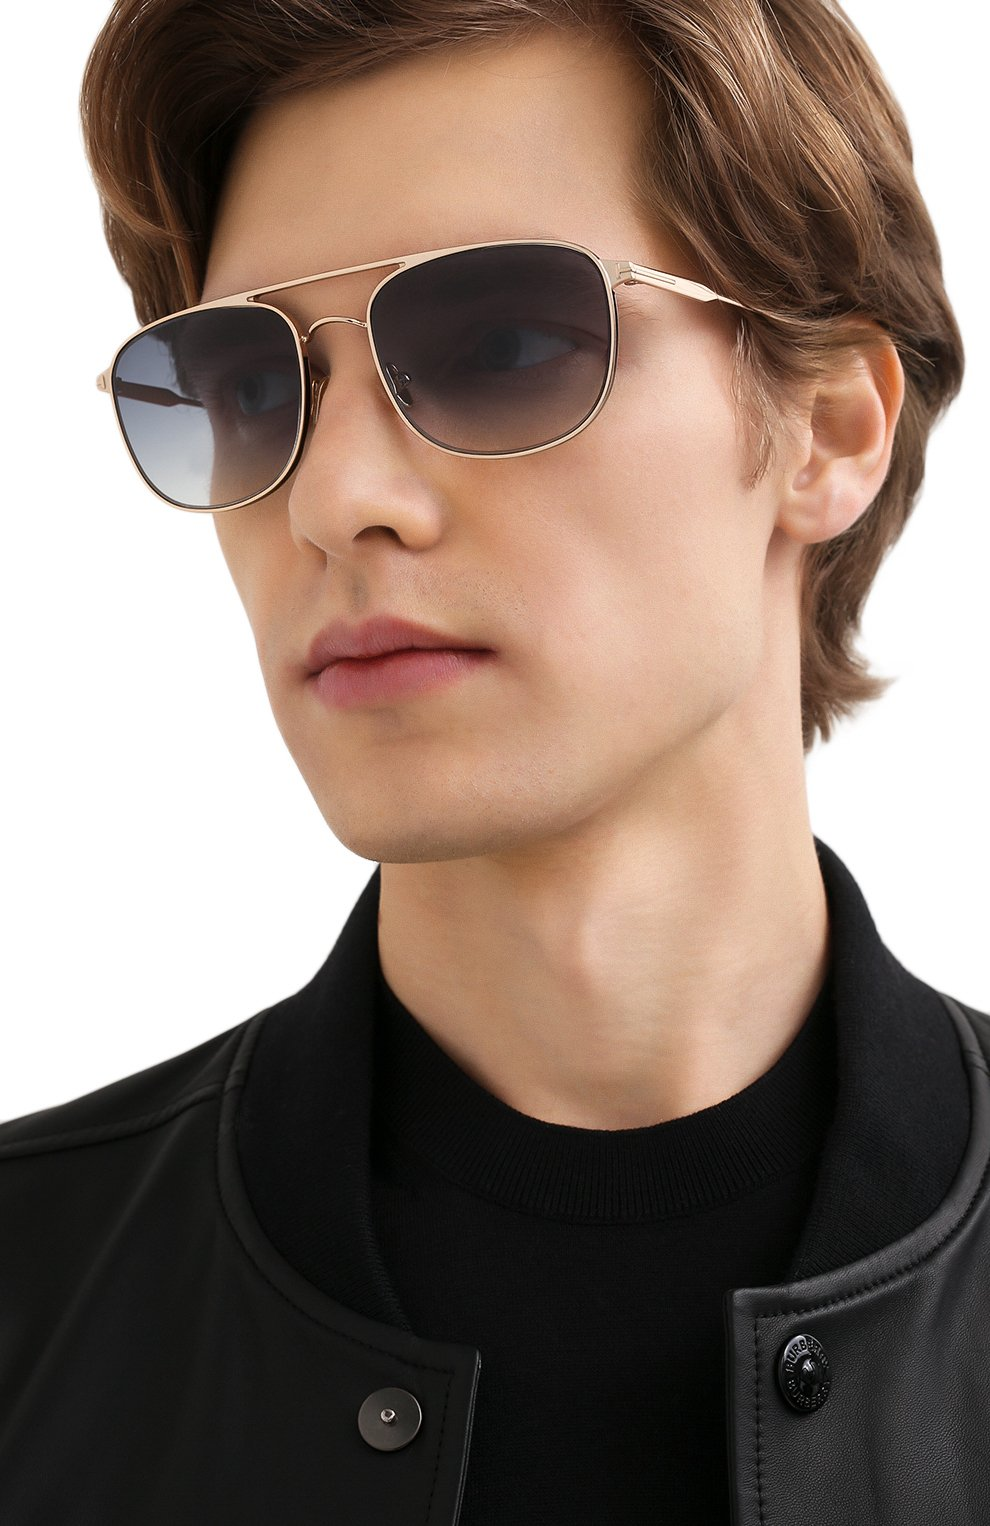 Мужские солнцезащитные очки TOM FORD золотого цвета, арт. TF827 28B | Фото 2